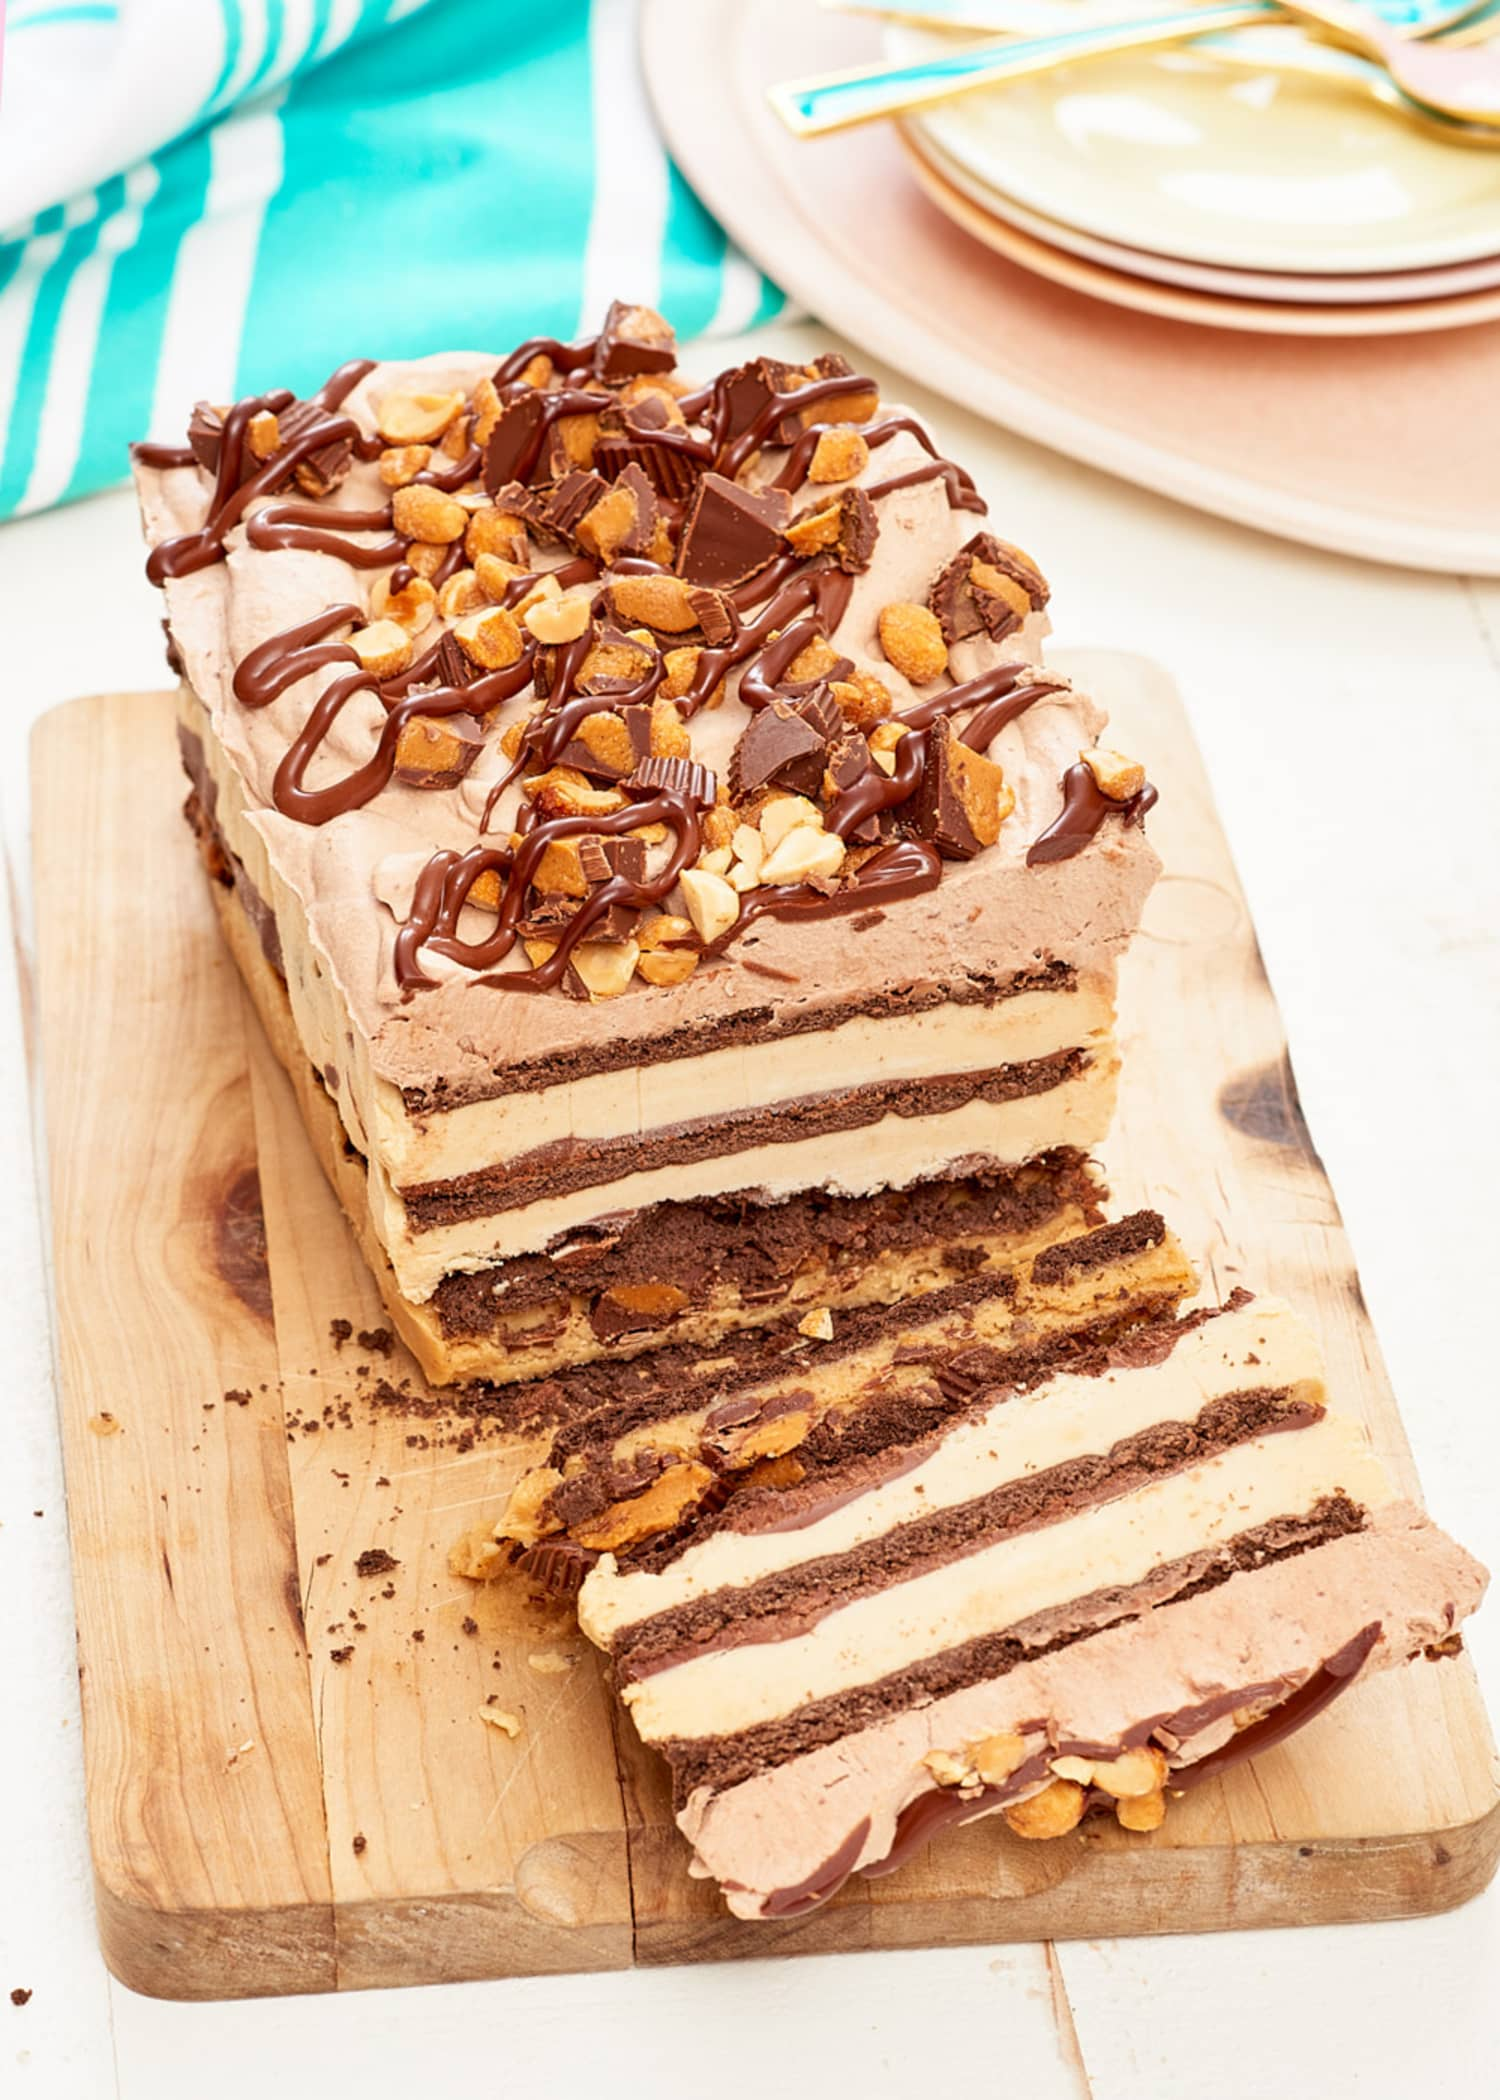 Recipe: Peanut Butter Chocolate Icebox Cake